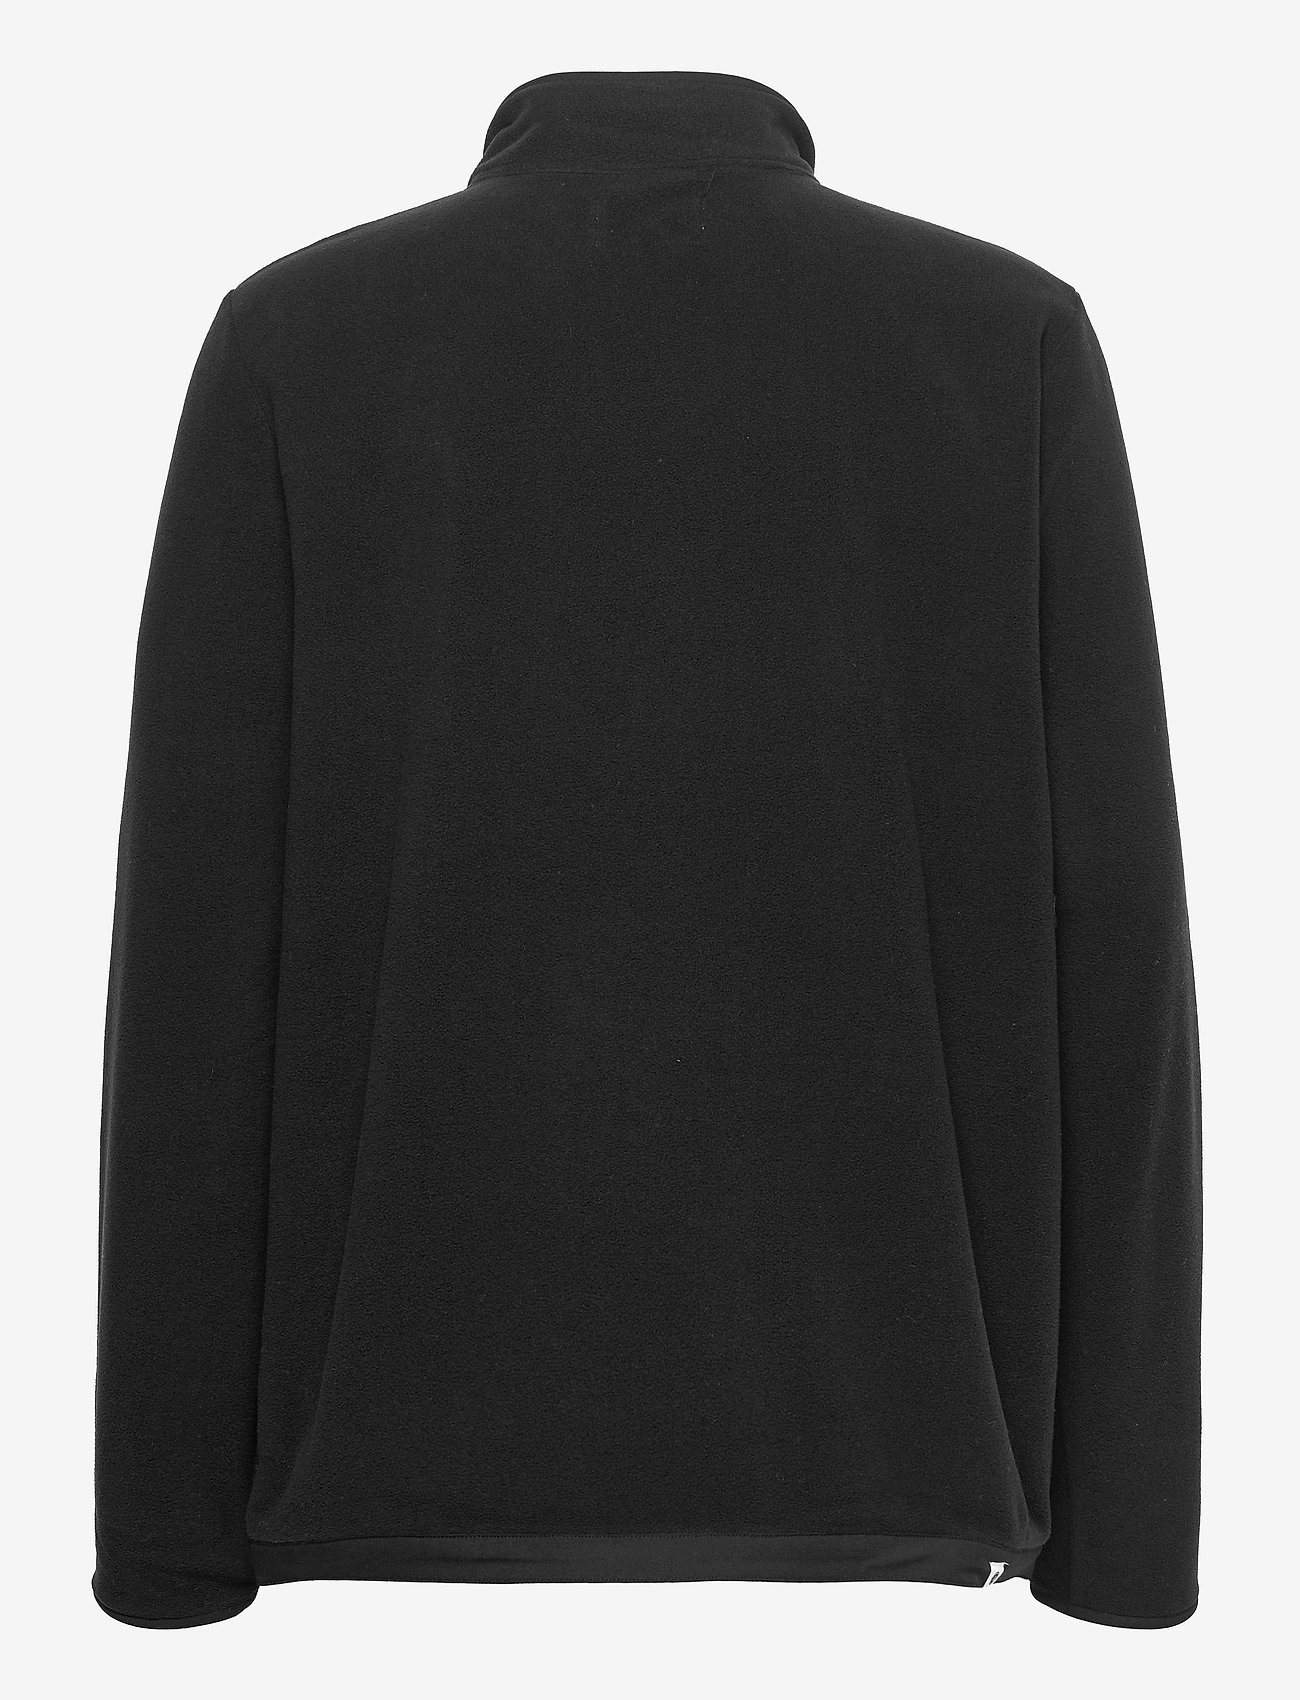 Anerkjendt - AKTOM FLEECE CARDIGAN - mid layer jackets - caviar - 1